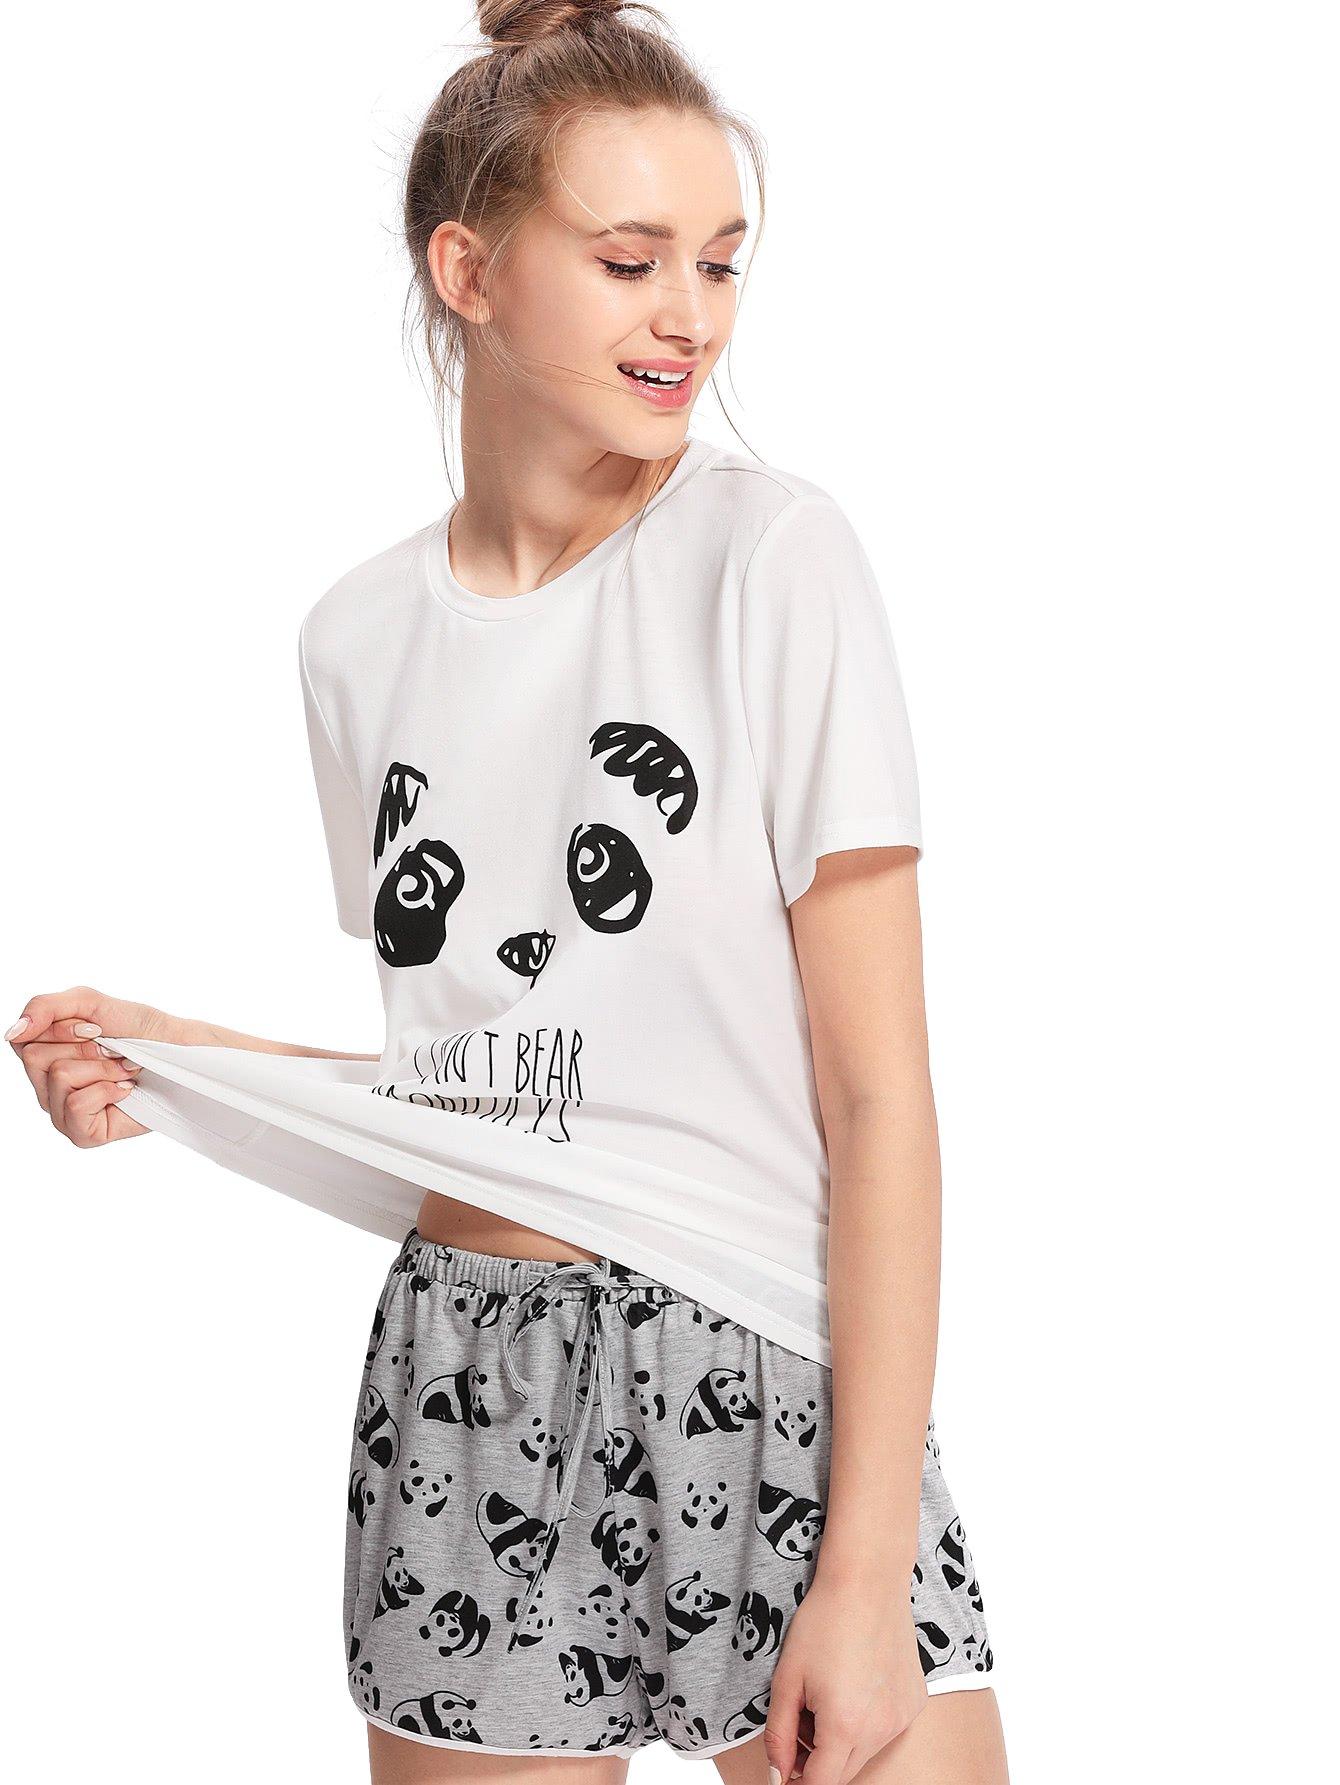 SheIn Women's Cute Cartoon Print Pajama Set Tee & Shorts Sleepwear X-Small Grey